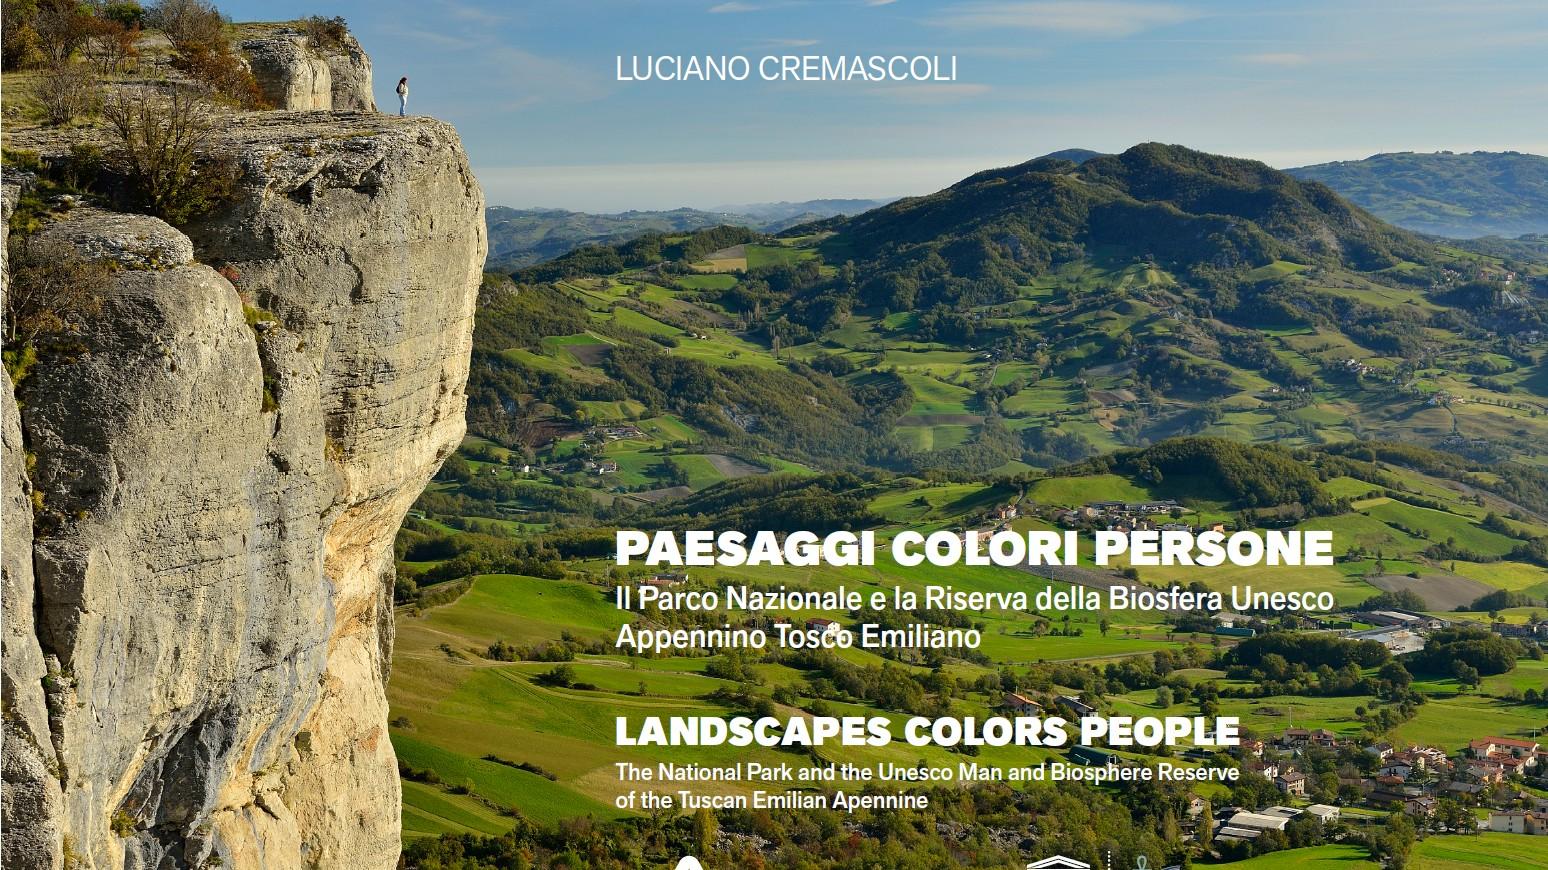 https://www.lucianocremascoli.com/fotosito/wp-content/uploads/2020/07/01-copertina.jpg